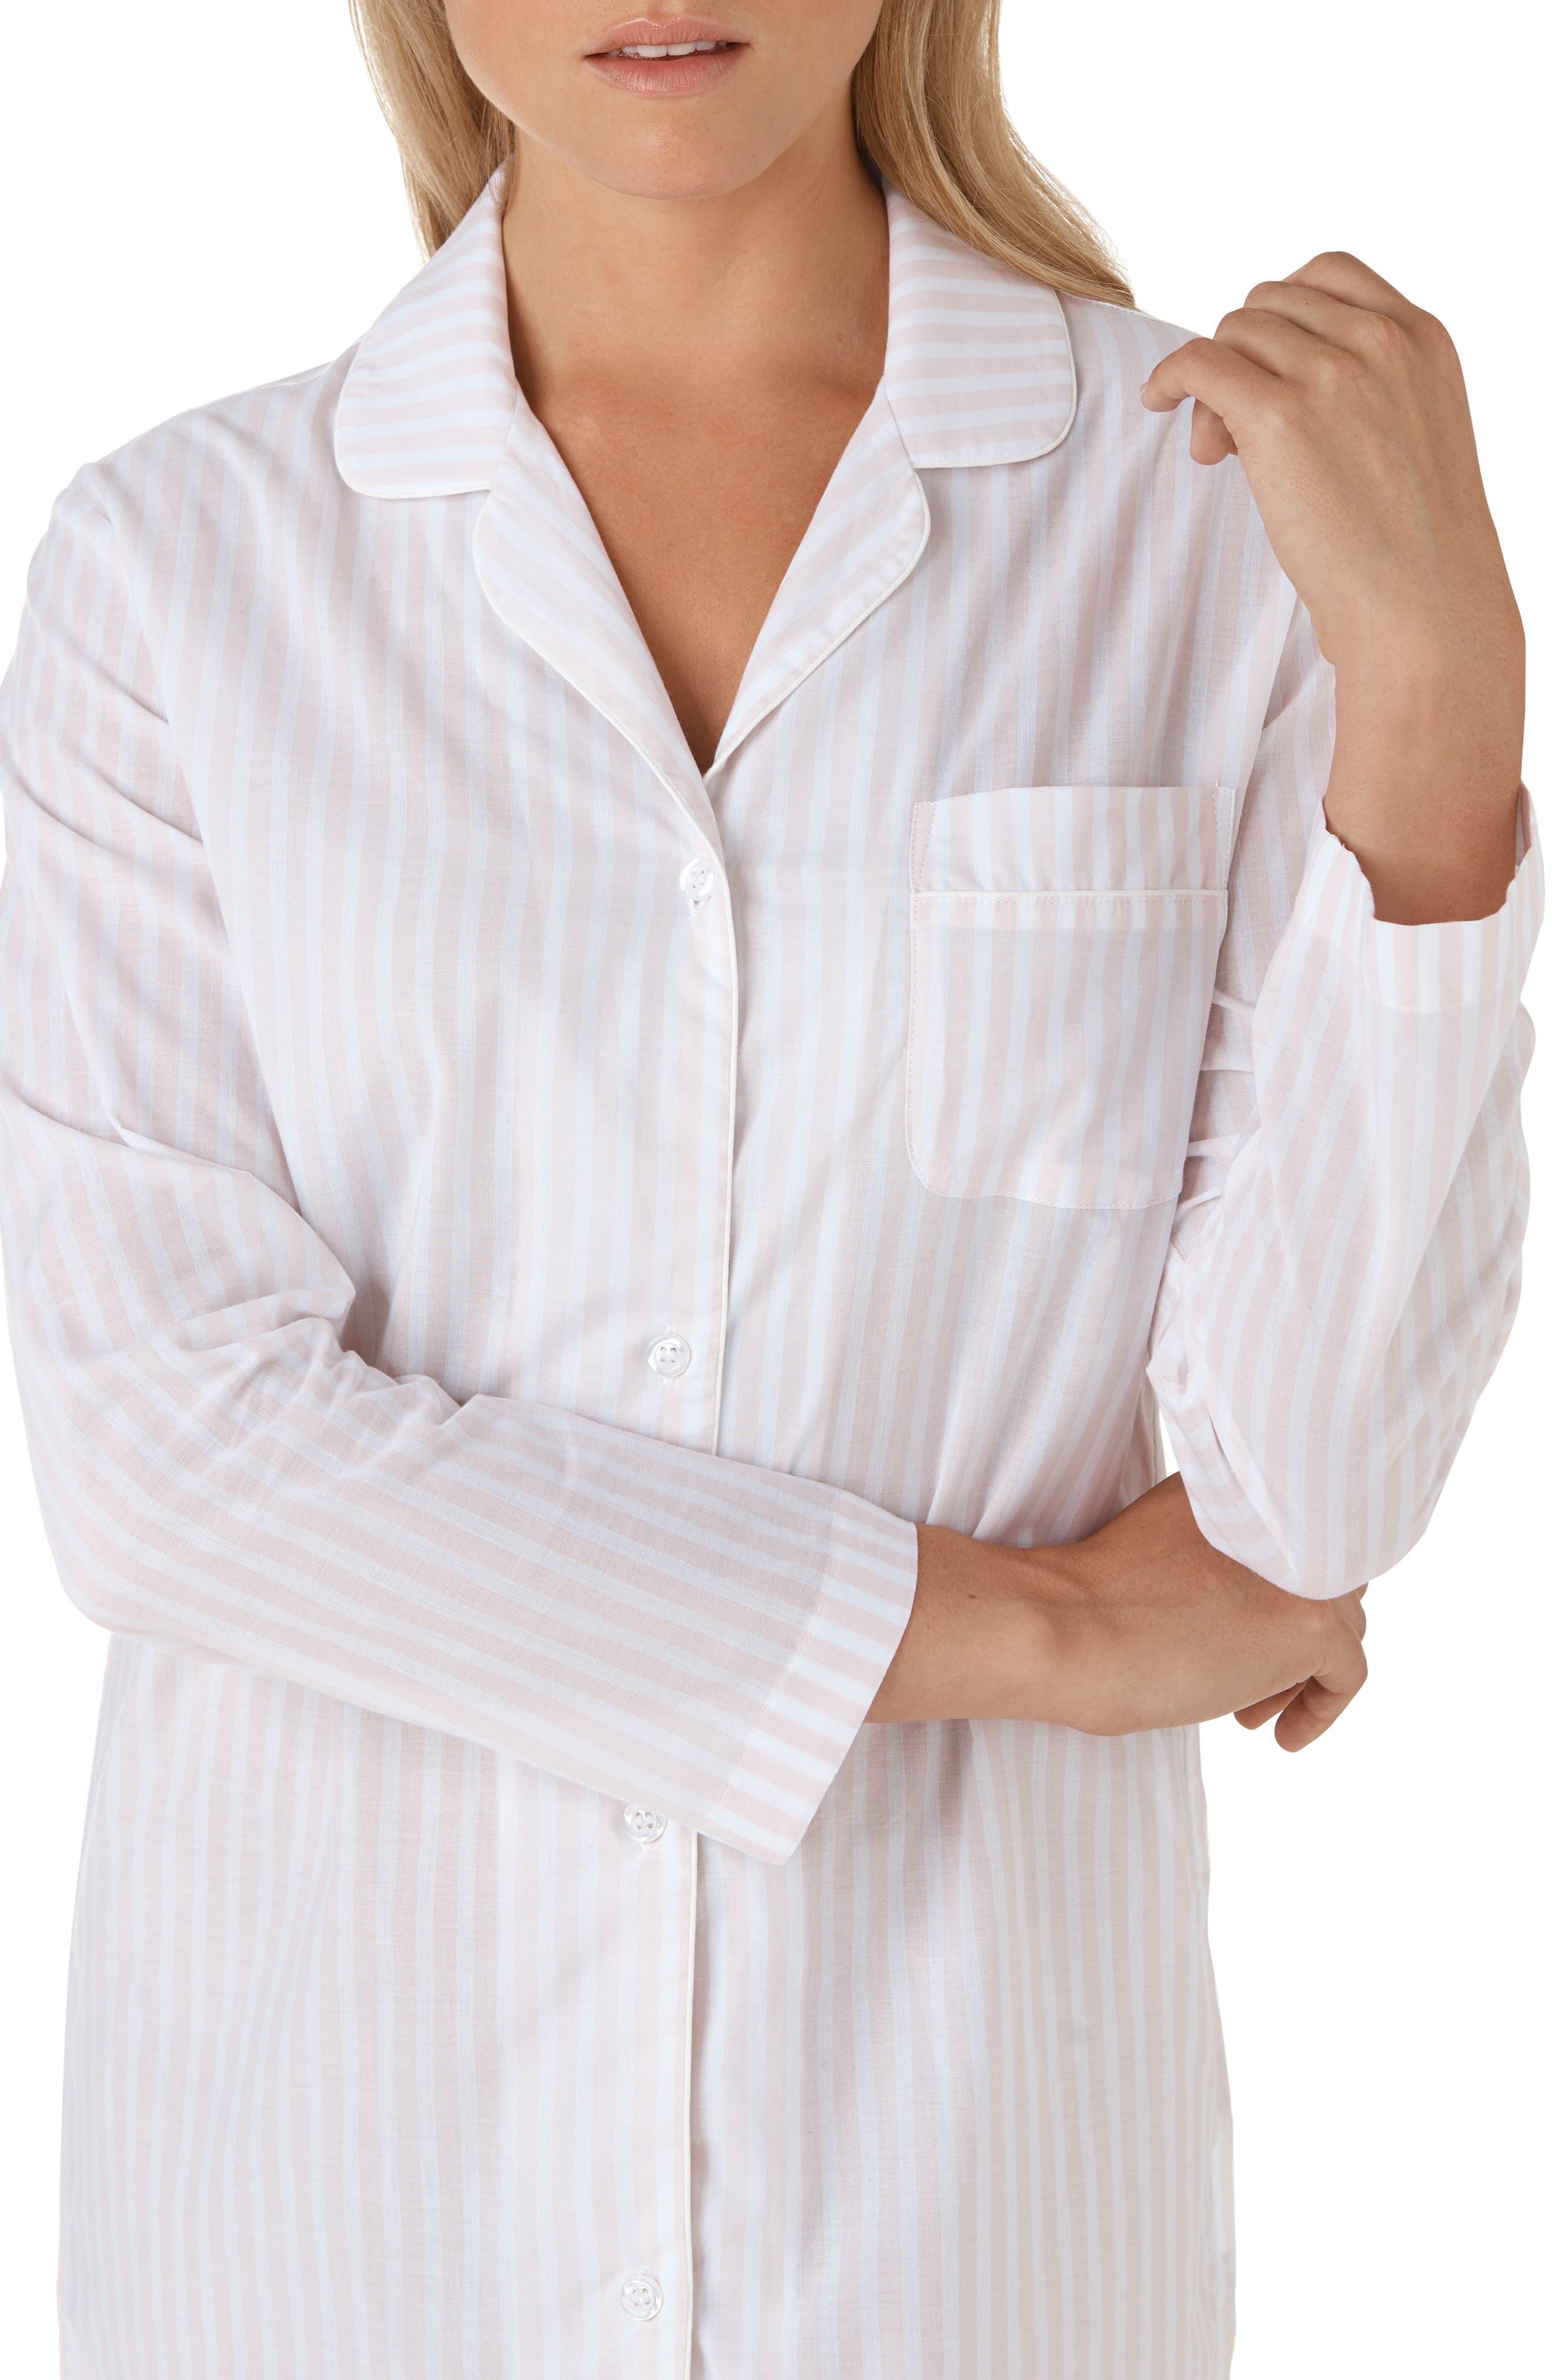 Stripe Cotton Sleep Shirt,                             Alternate thumbnail 4, color,                             PINK / WHITE STRIPE